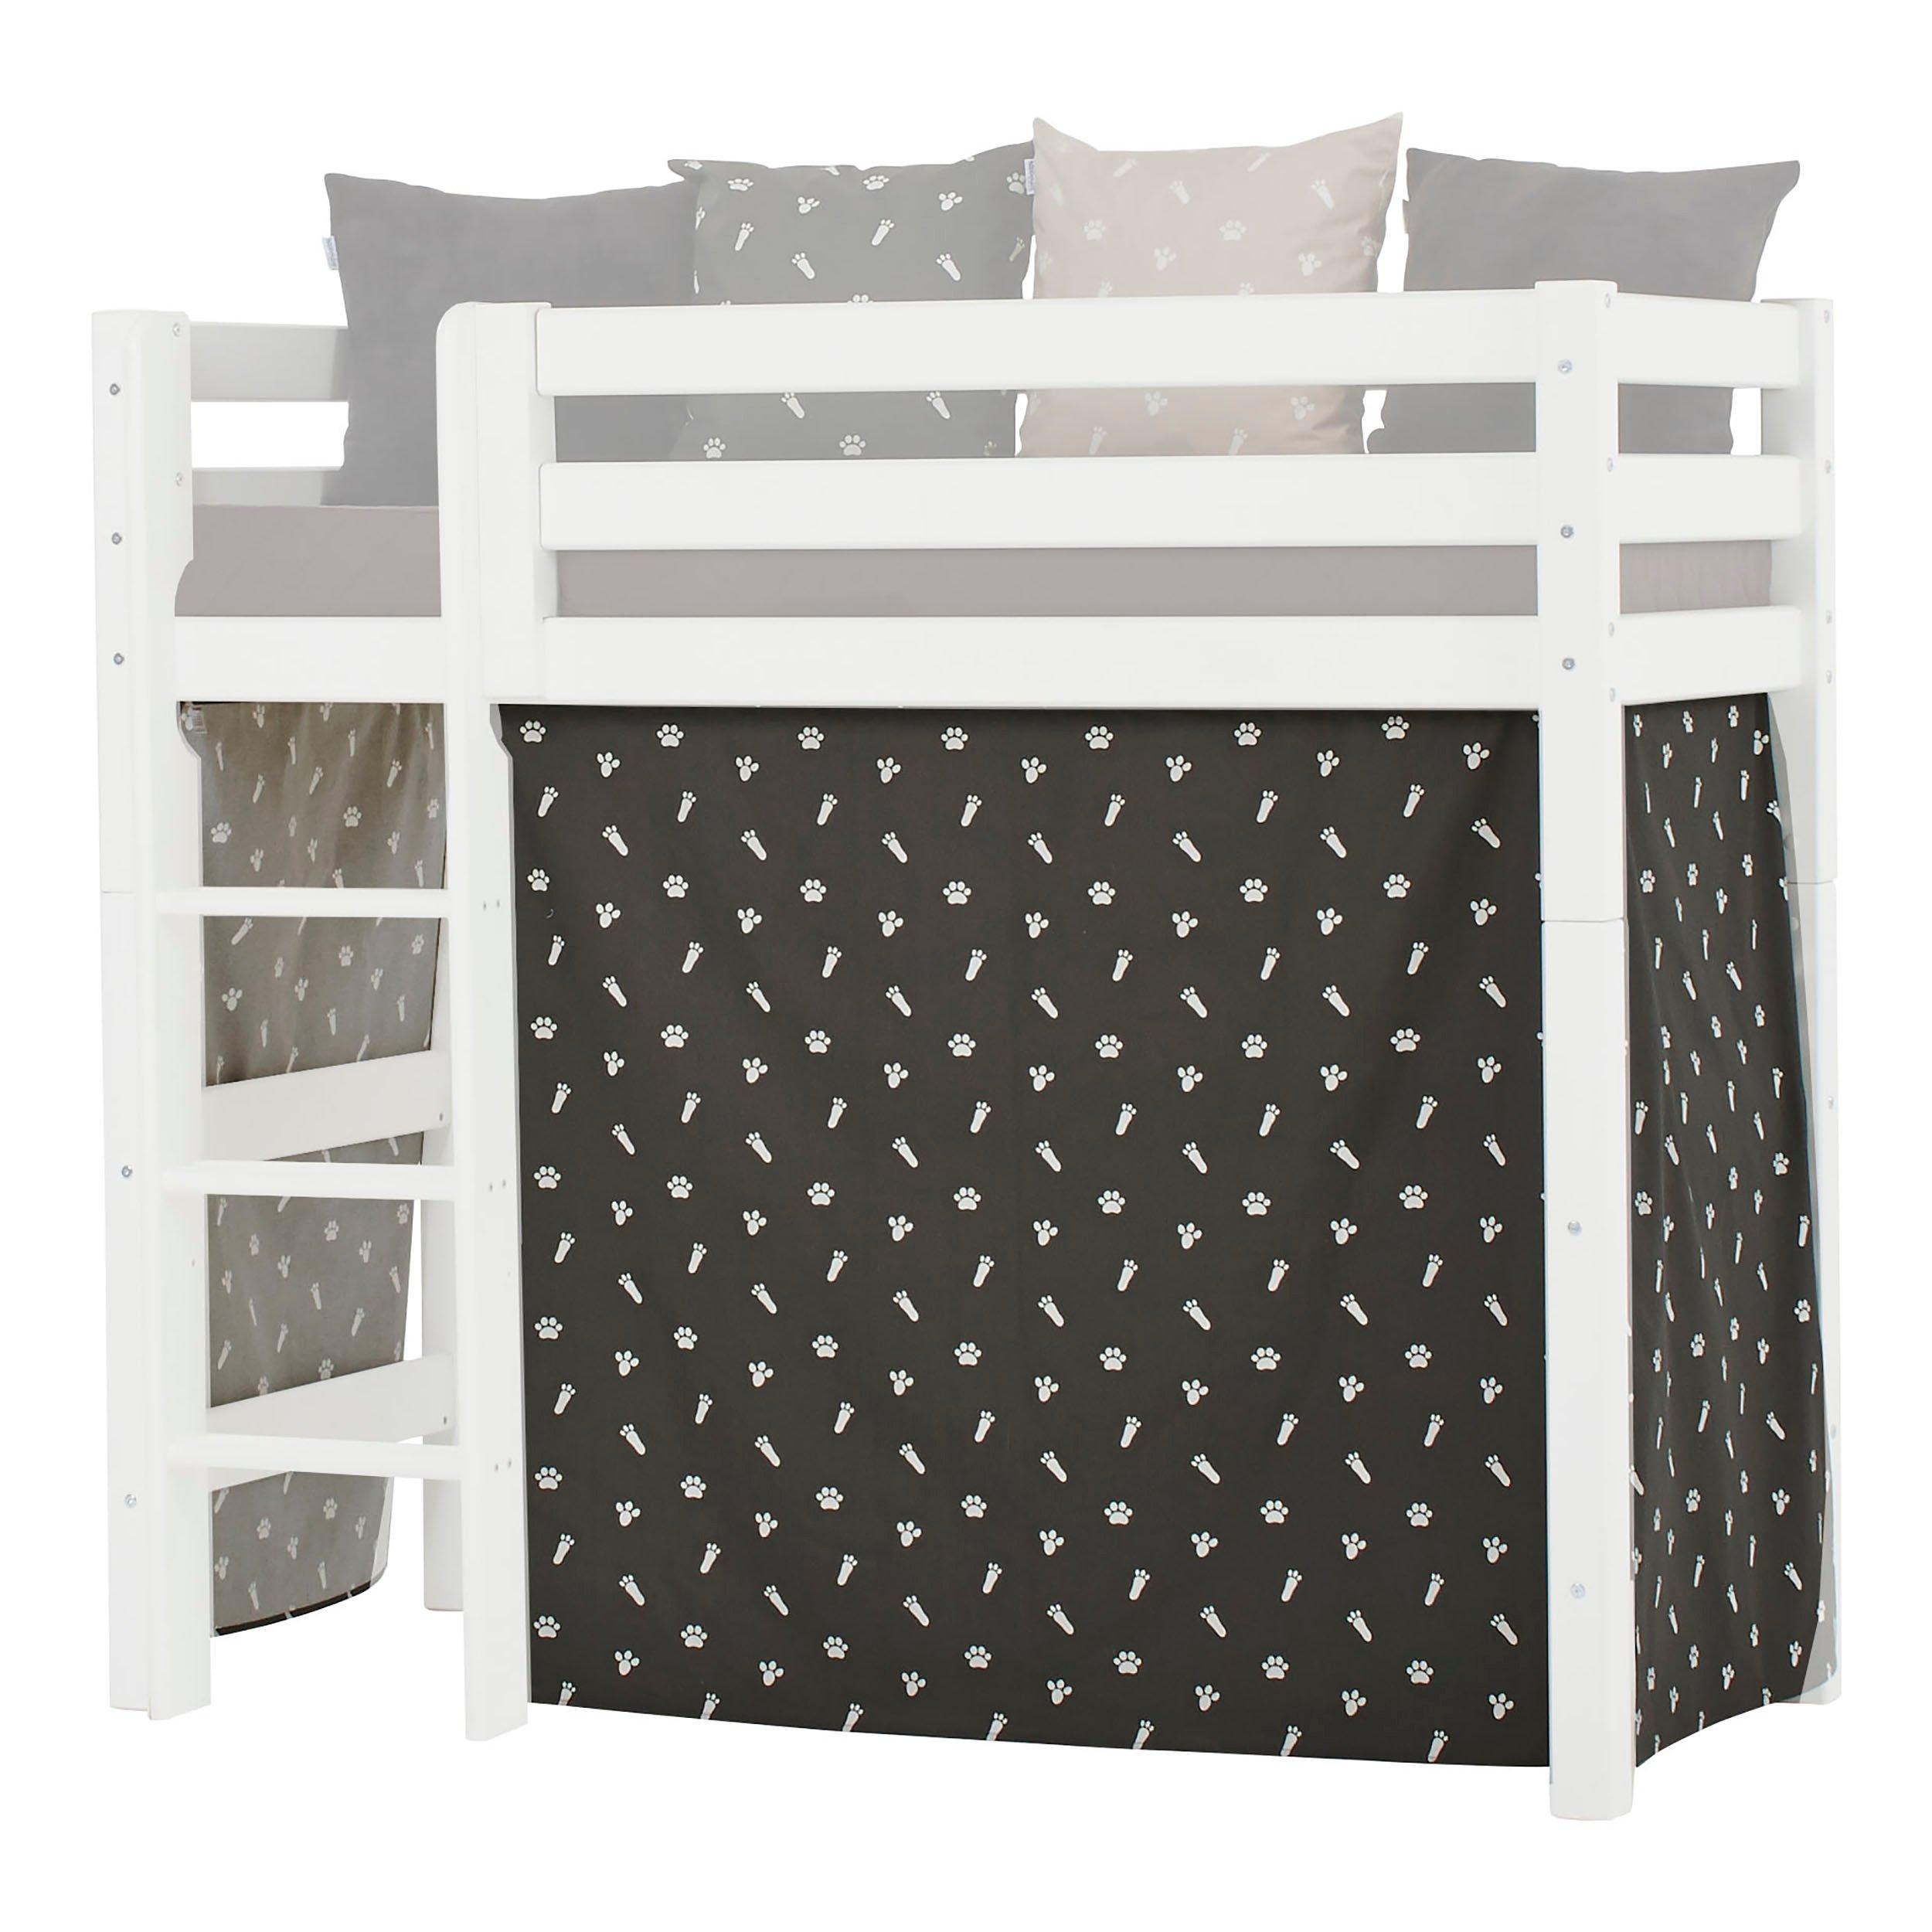 Hoppekids - Play Curtain Mid-High Bed 70x160 cm - Pets Granite Grey